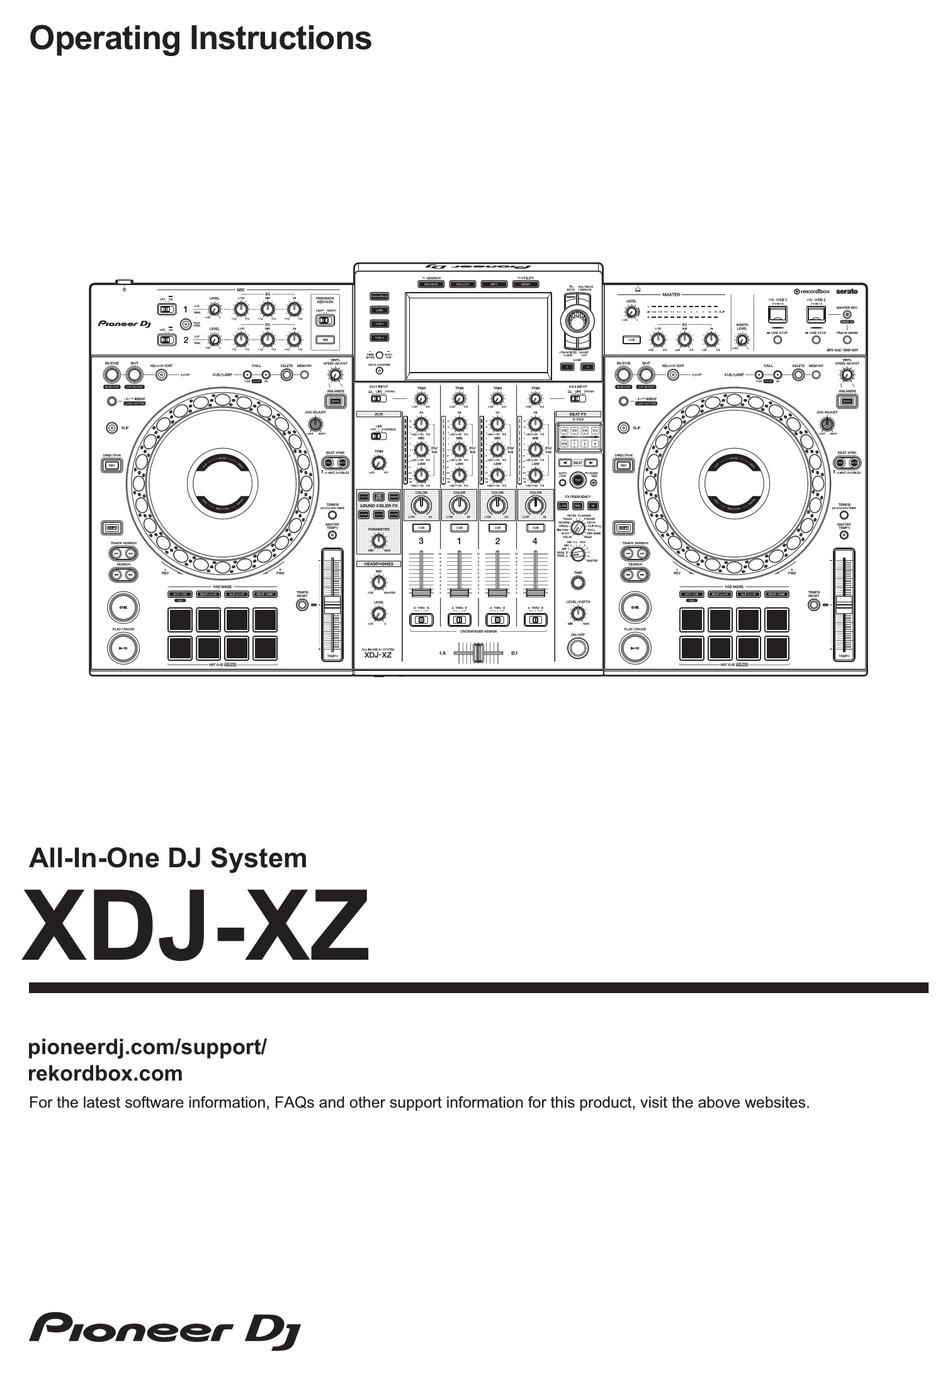 PIONEER DJ XDJ-XZ OPERATING INSTRUCTIONS MANUAL Pdf